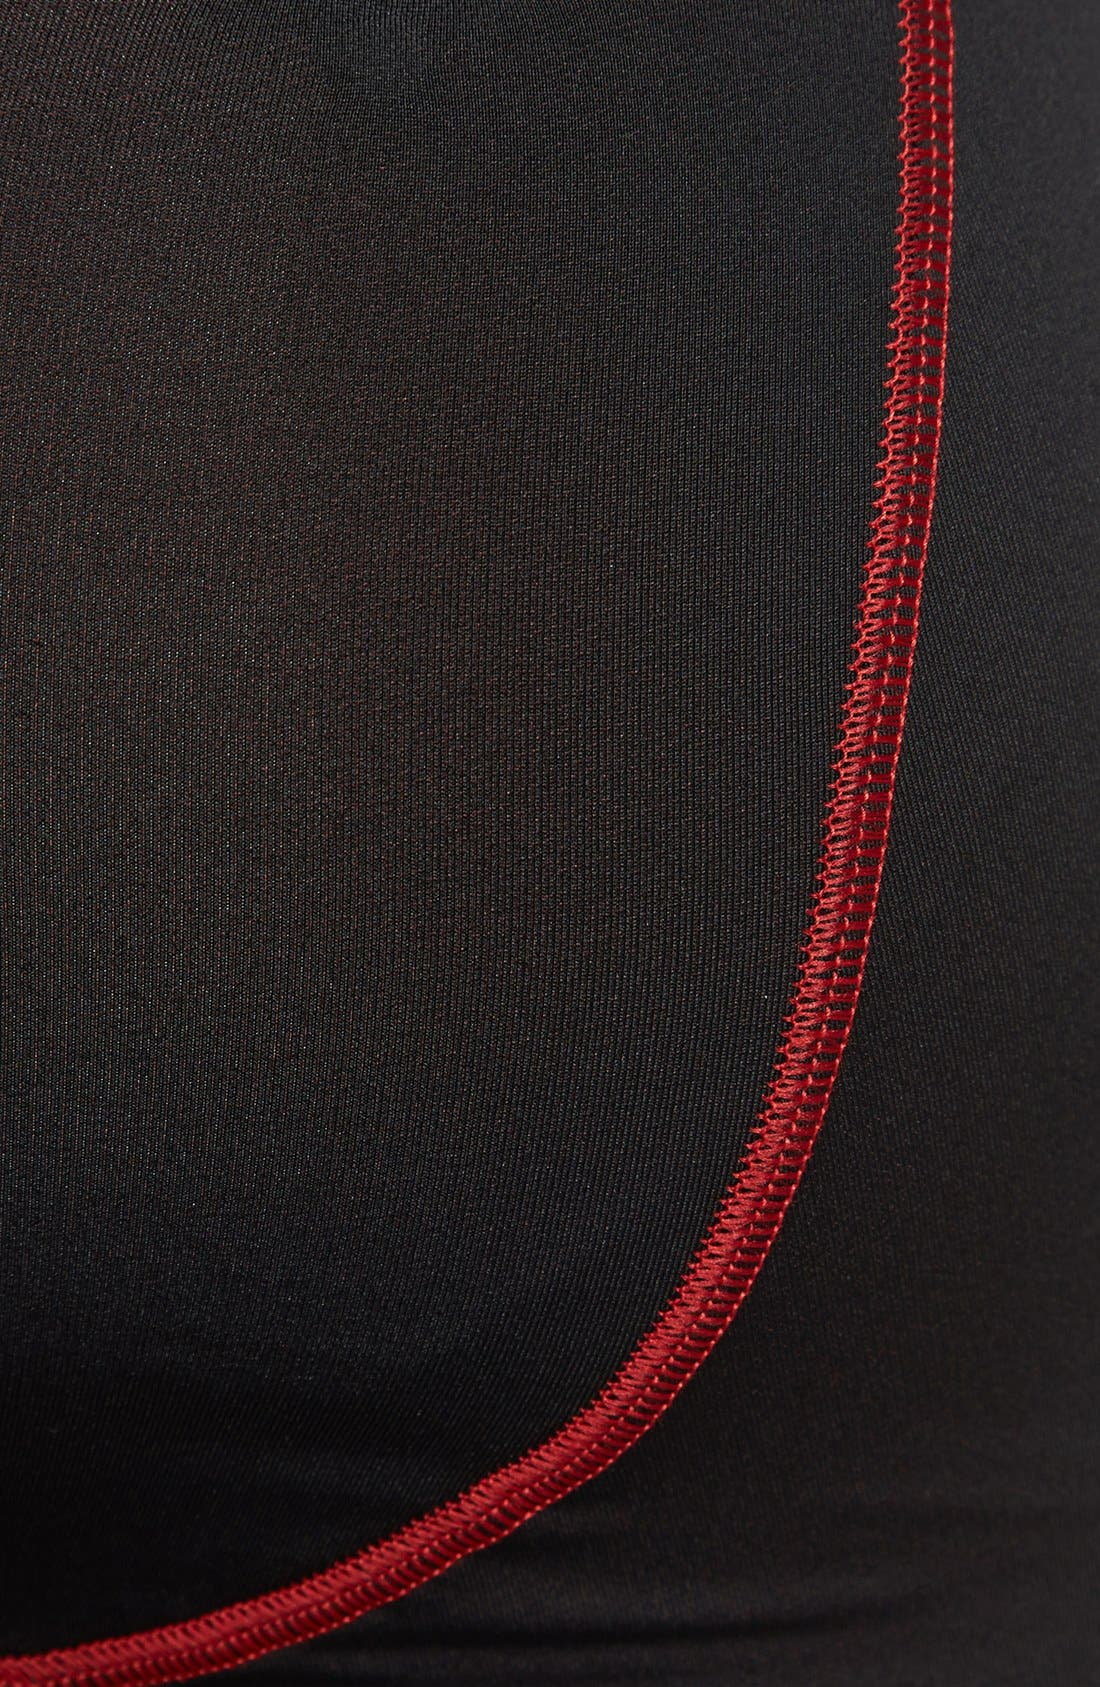 Alternate Image 3  - Nike Hyperwarm Dri-FIT Max Compression Athletic Leggings (Regular Retail Price: $60.00)